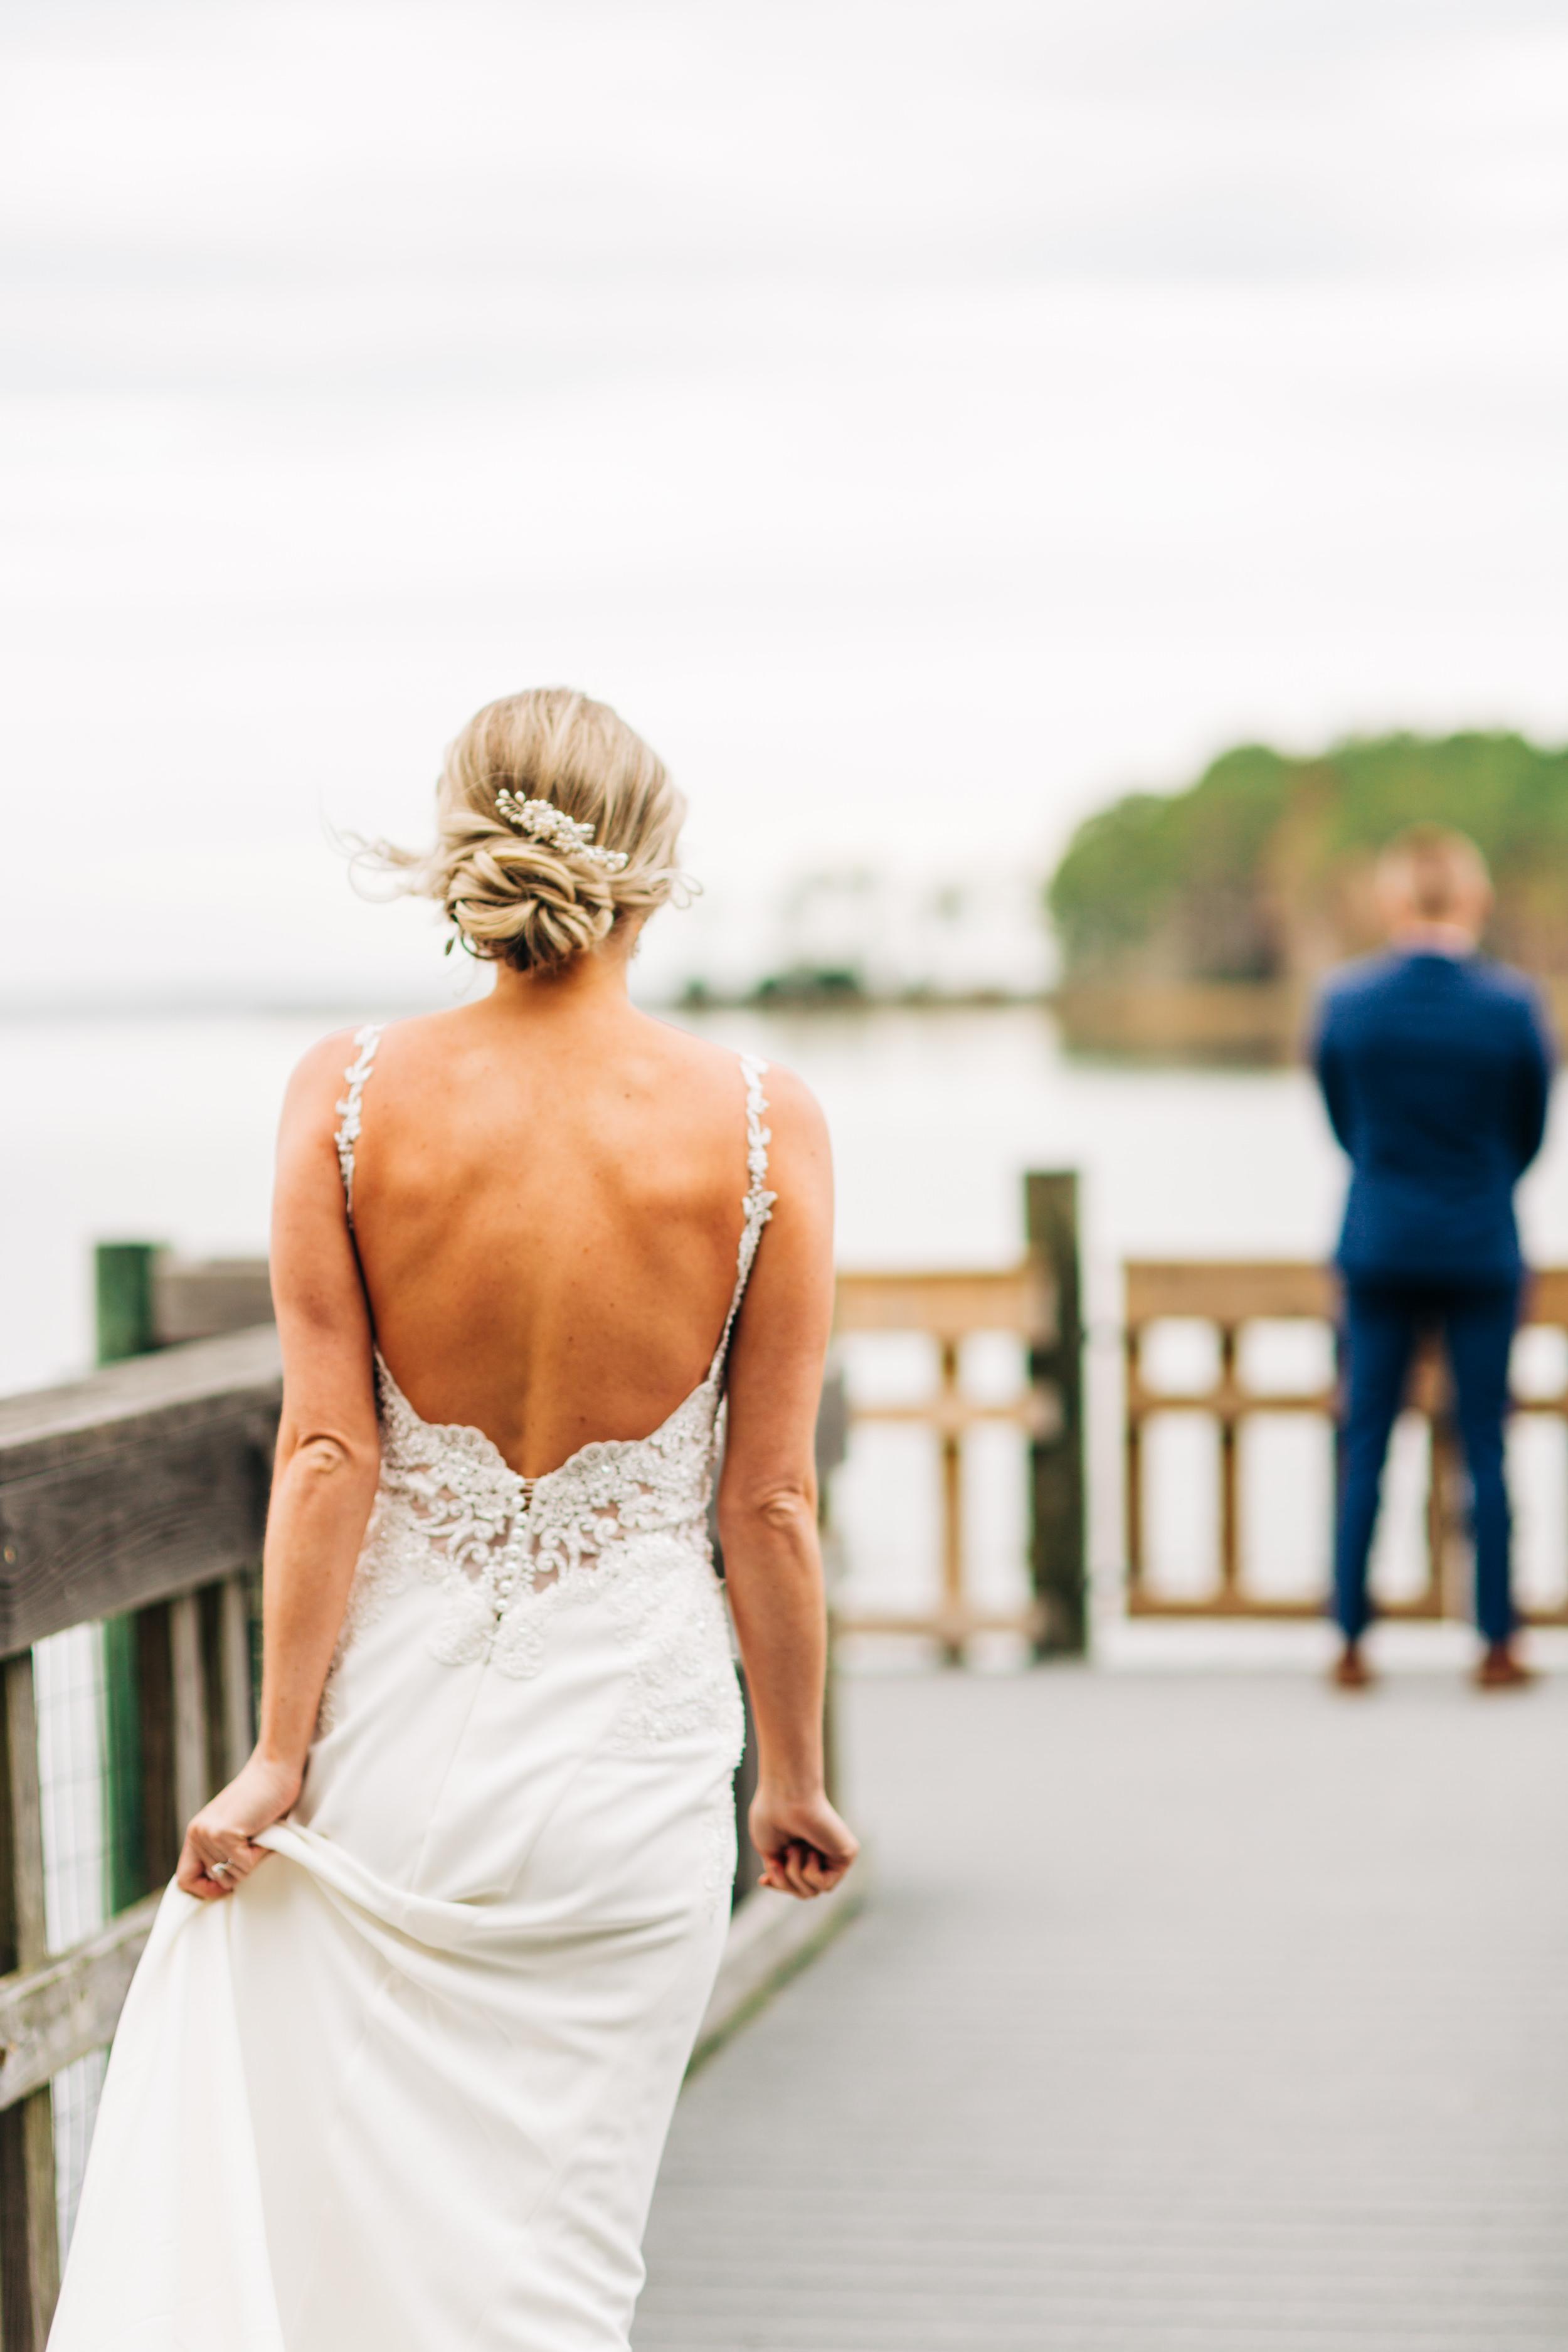 Ricky & Brittney - Pre Ceremony - Jake & Katie Photography_317.jpg